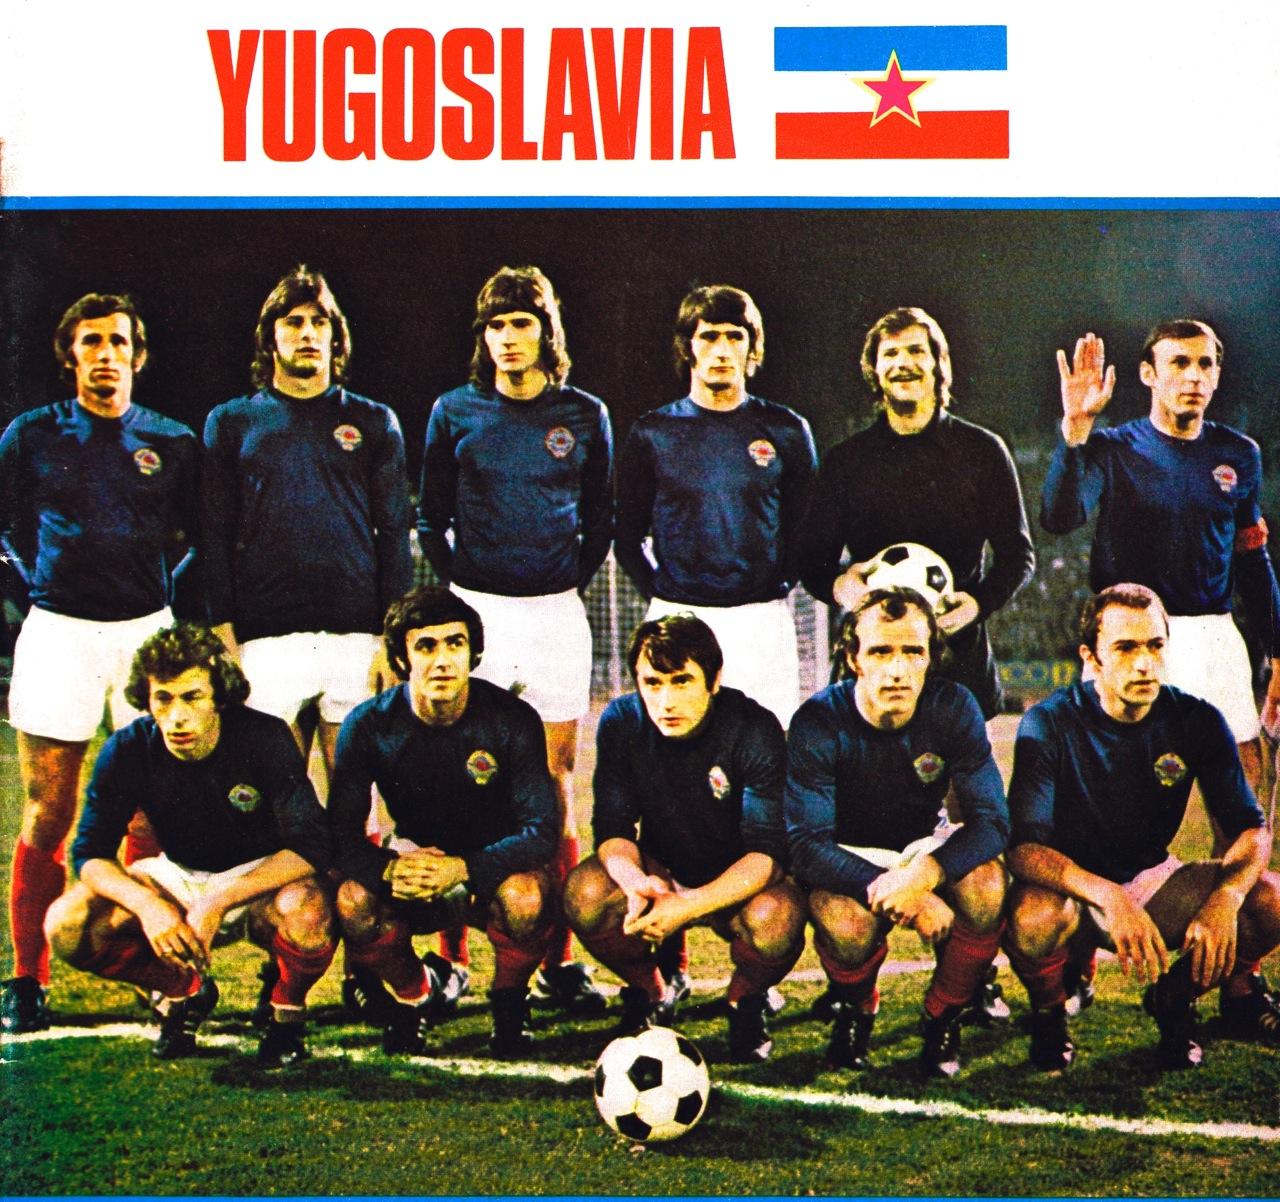 Yugoslavia 1974 | Beyond The Last Man